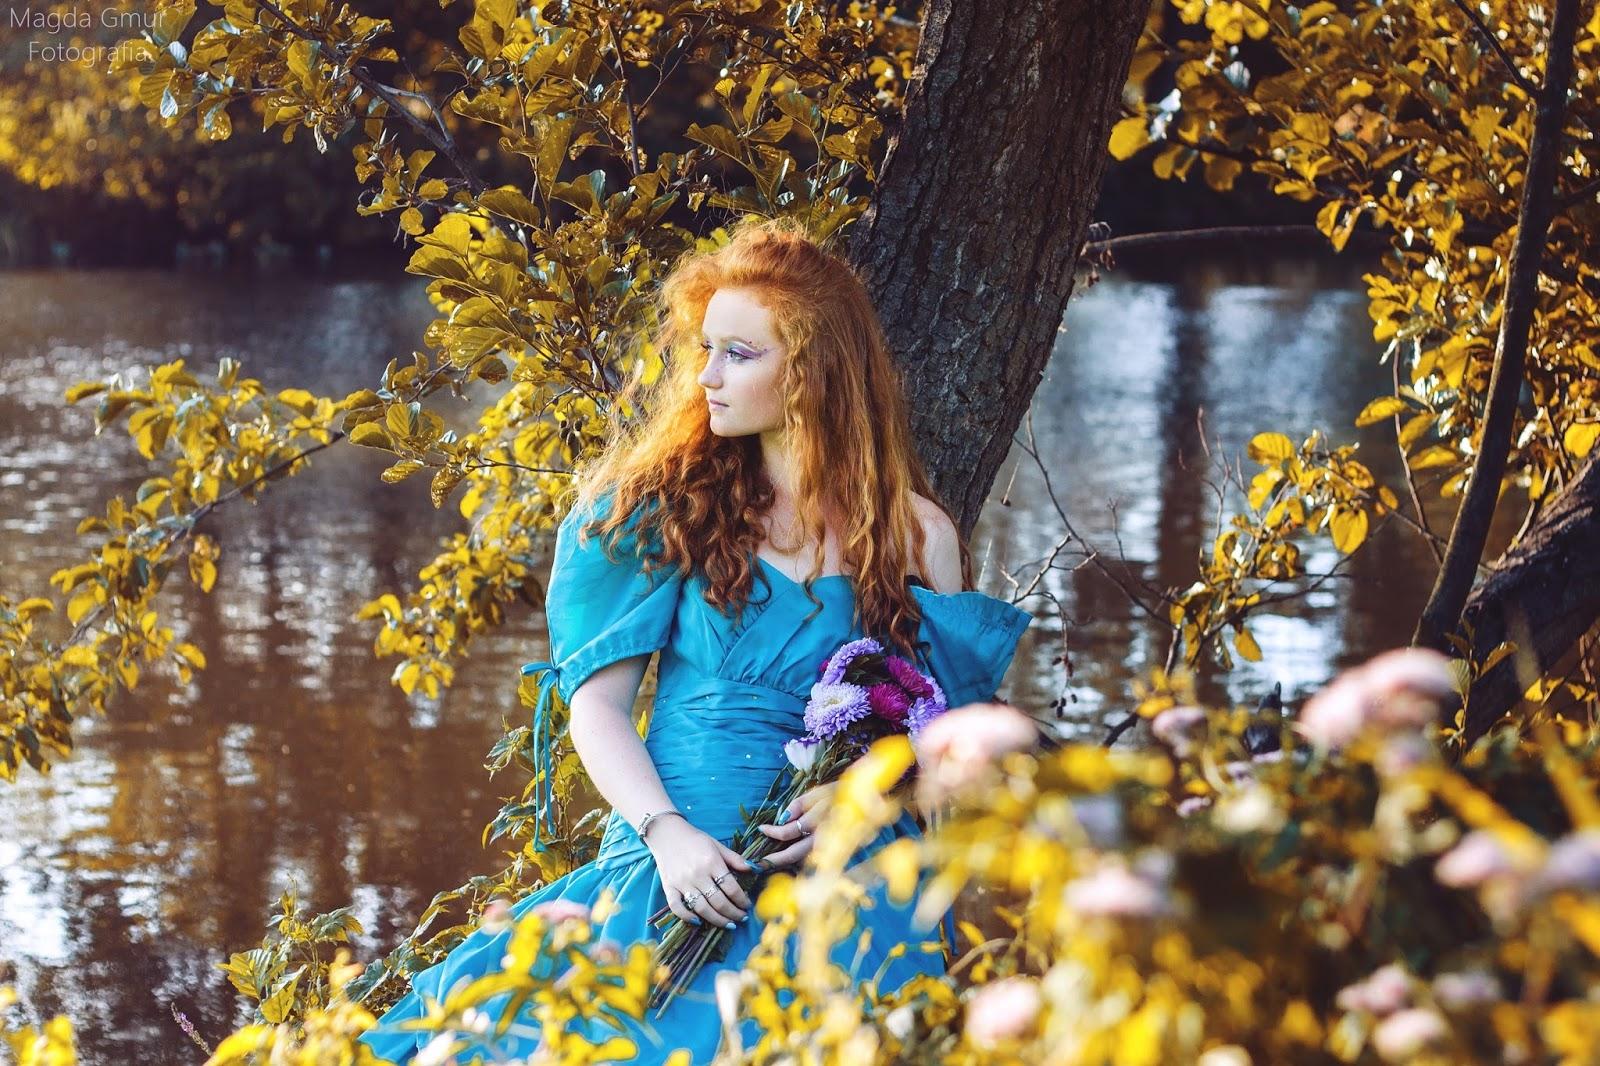 bajkowa sesja zdjęciowa, ginger, gingergirl, bajkowa suknia